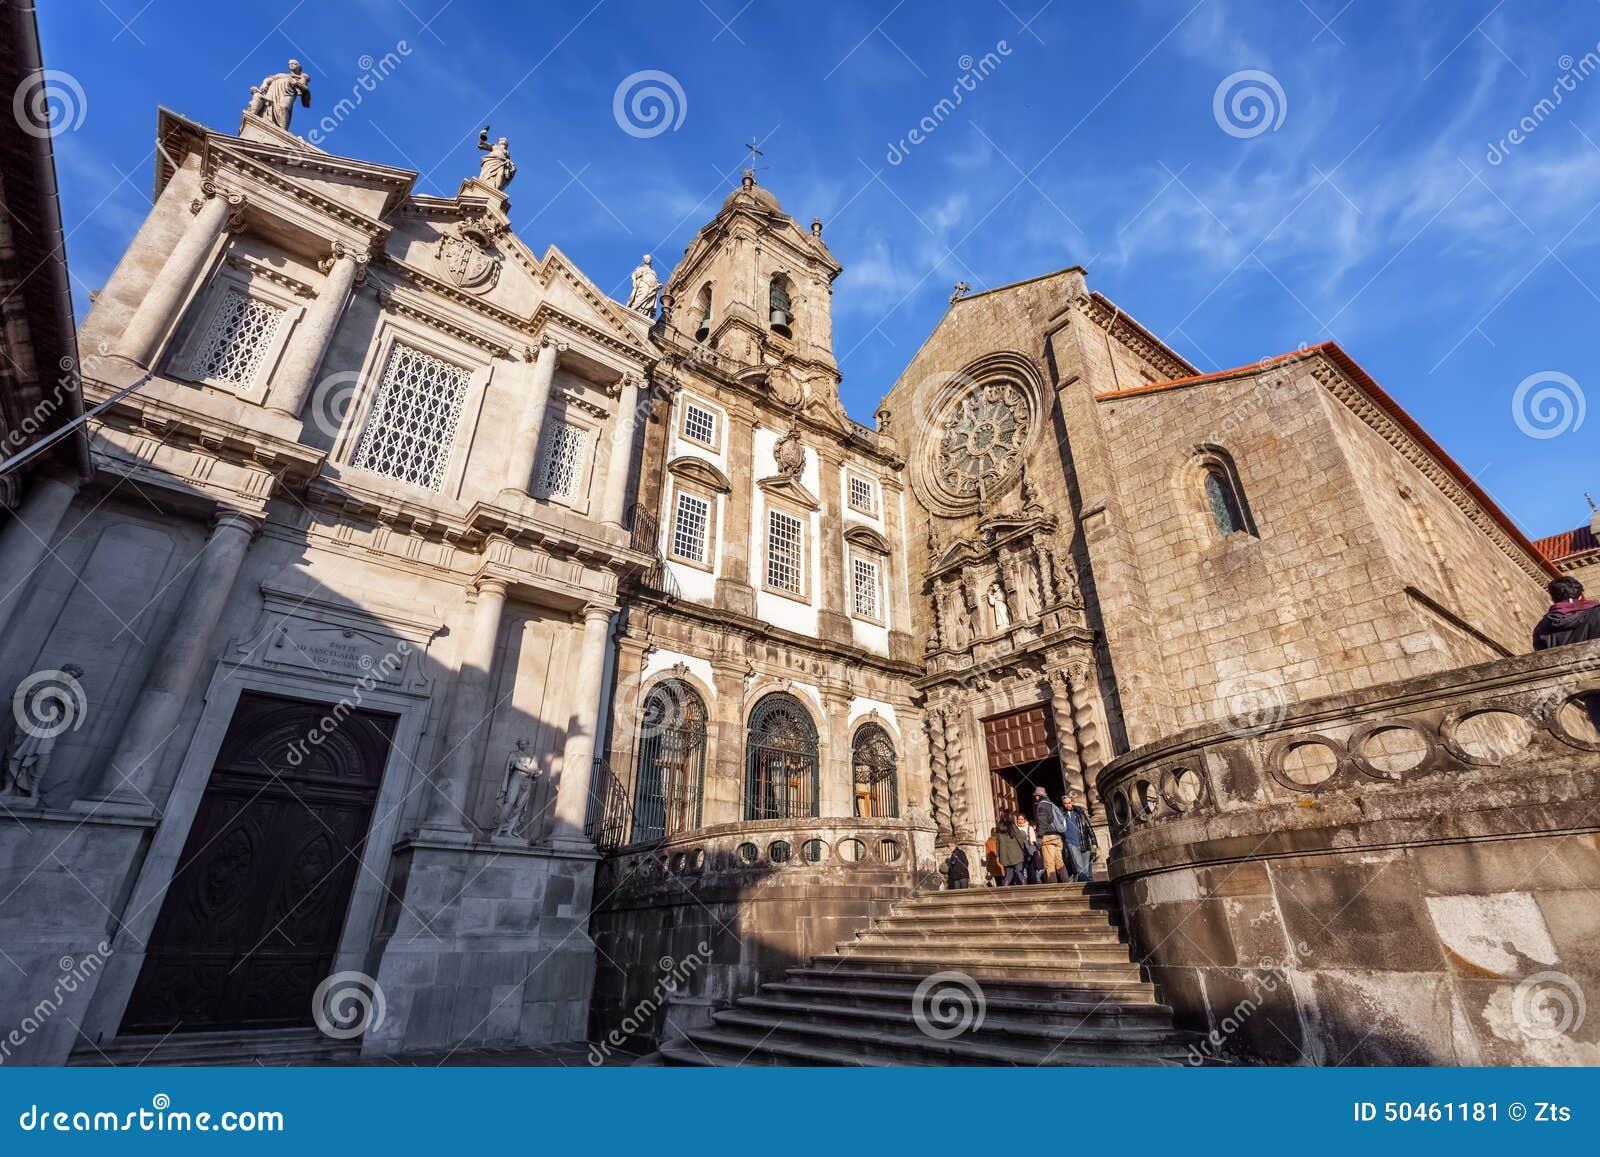 Sao Francisco Church, recht, de 14de eeuw Gotische architectuur